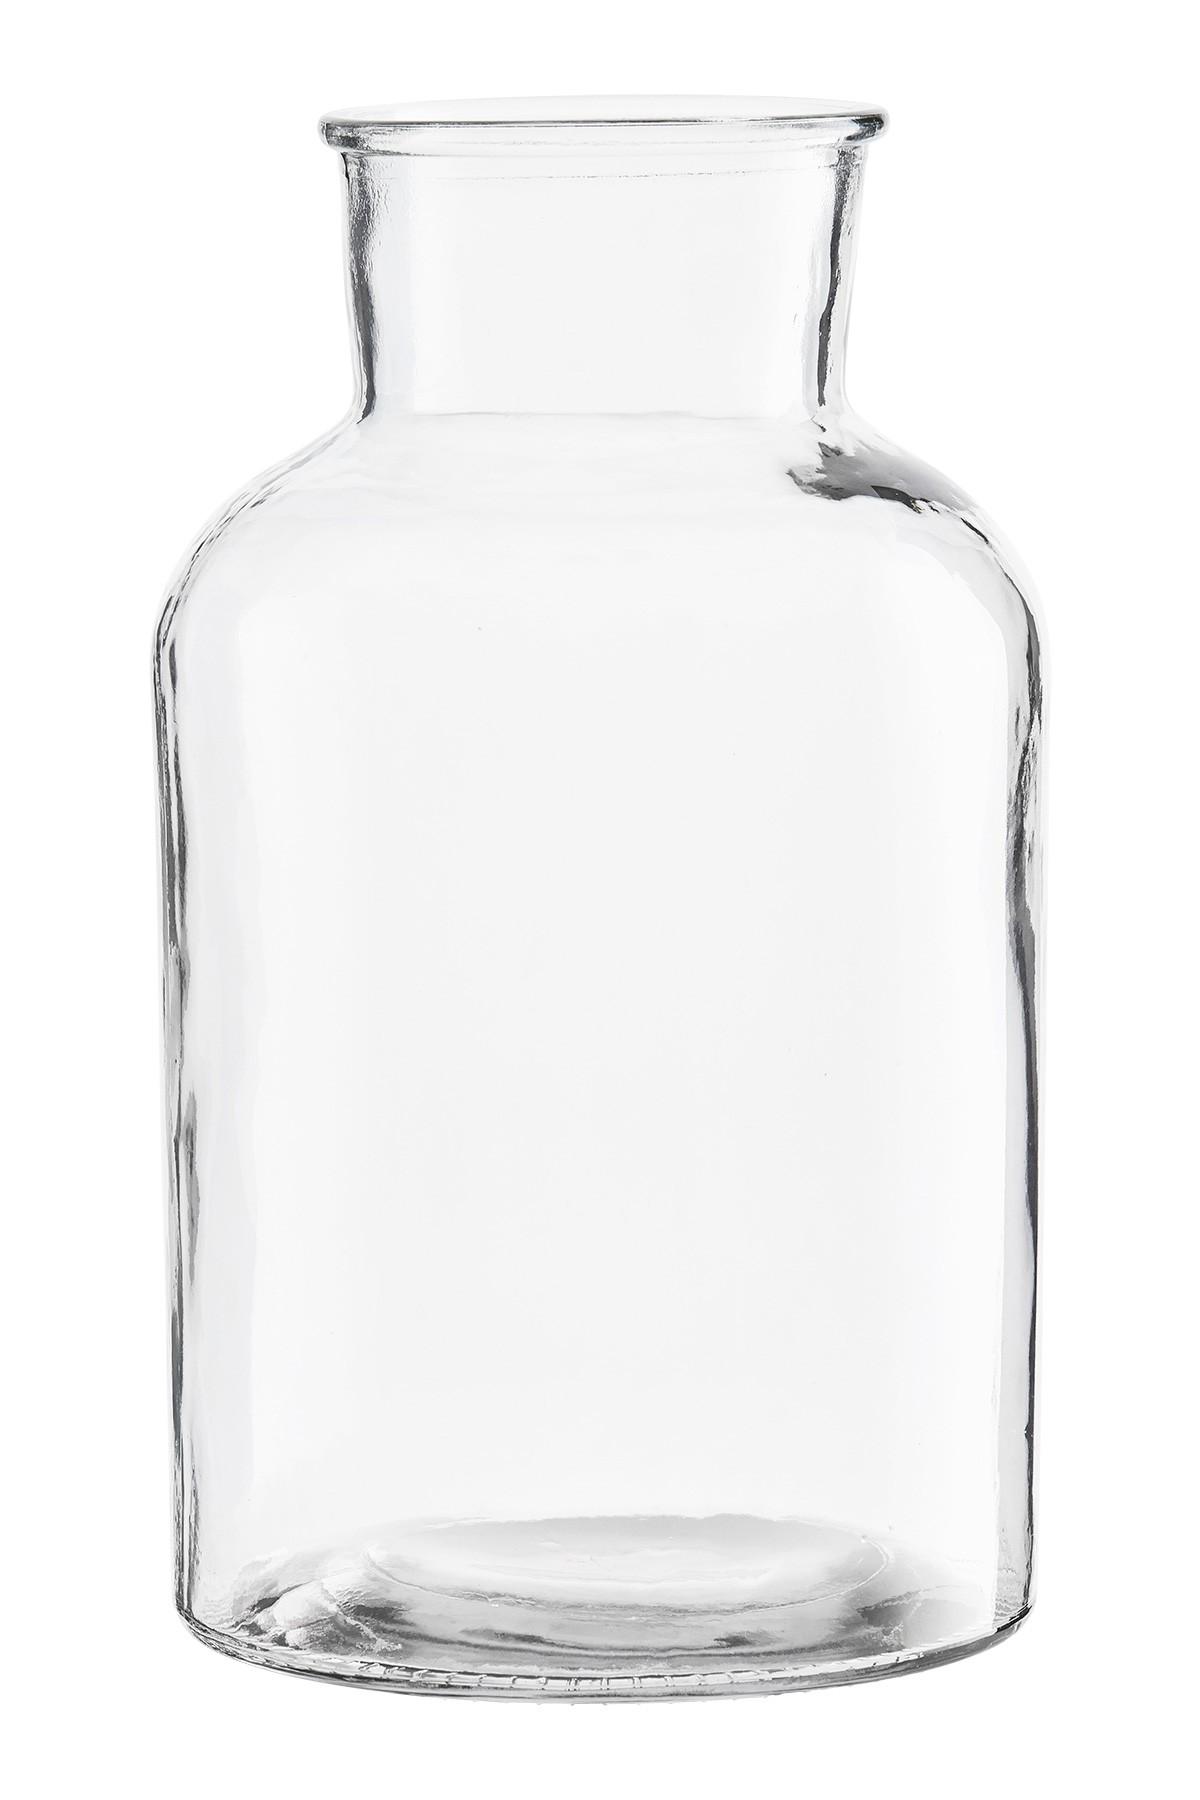 Vase Glas Blumenvase Glasvase Tischvase Bodenvase Glass House Doctor